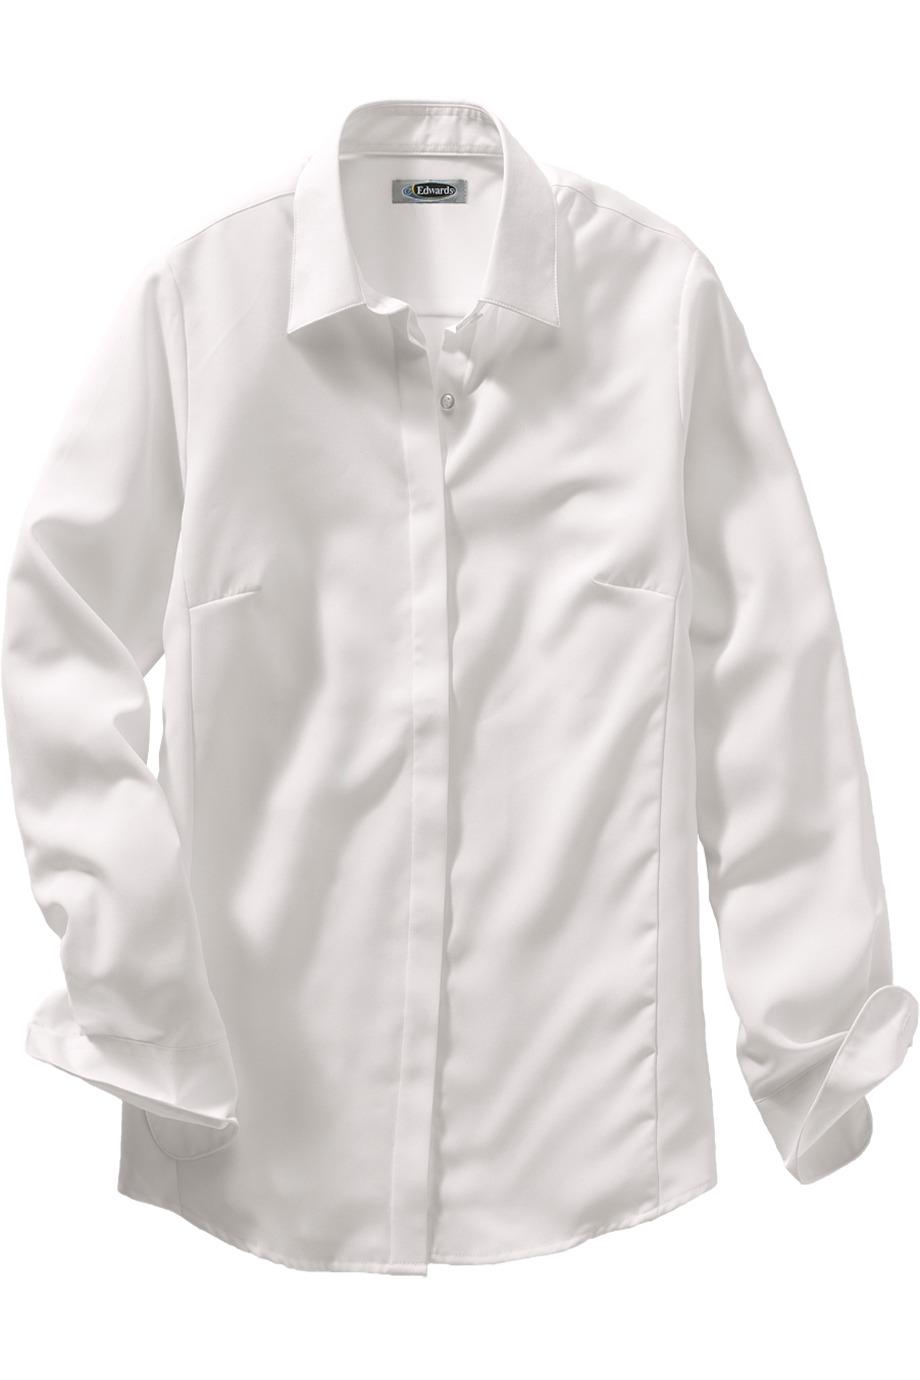 Edwards Garment 5291 - Women's Batiste Cafe Blouse